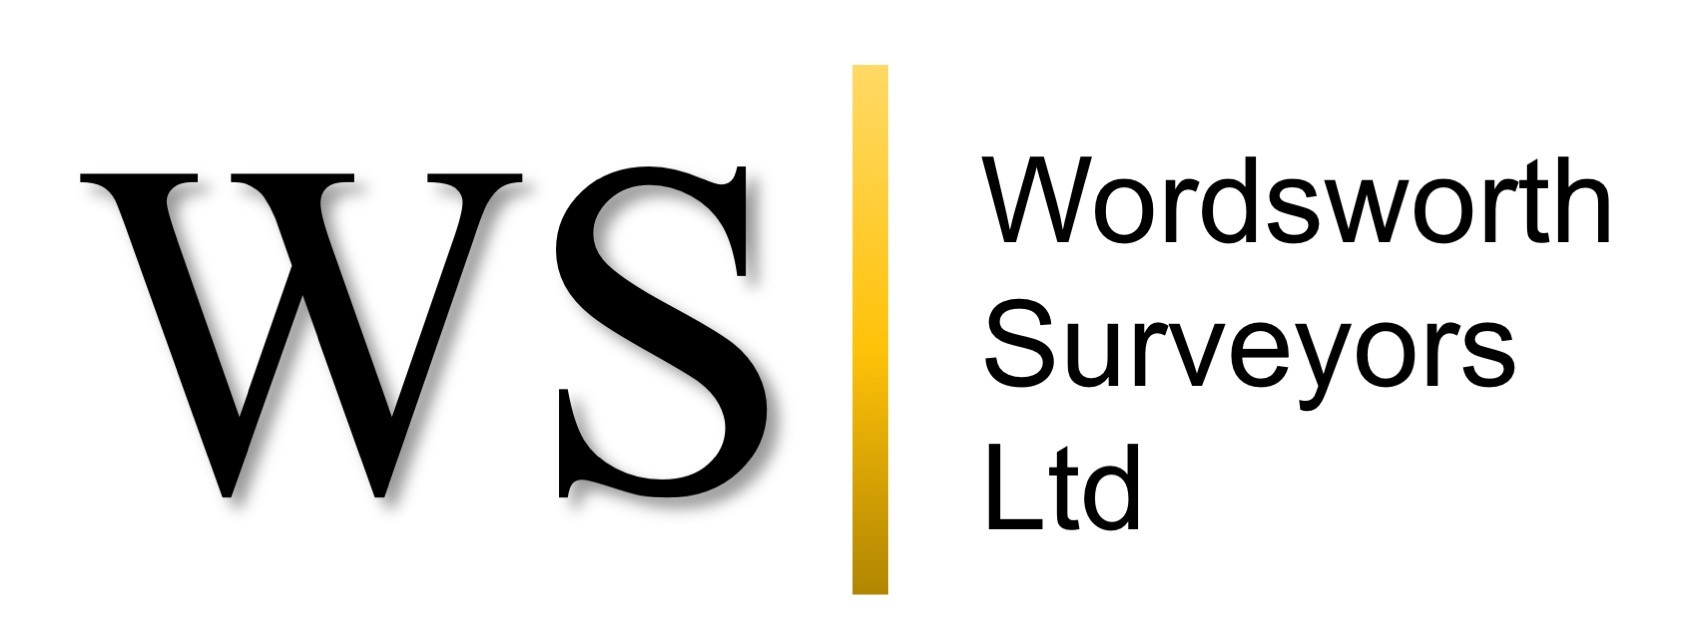 Wordsworth-Surveyors-Ltd